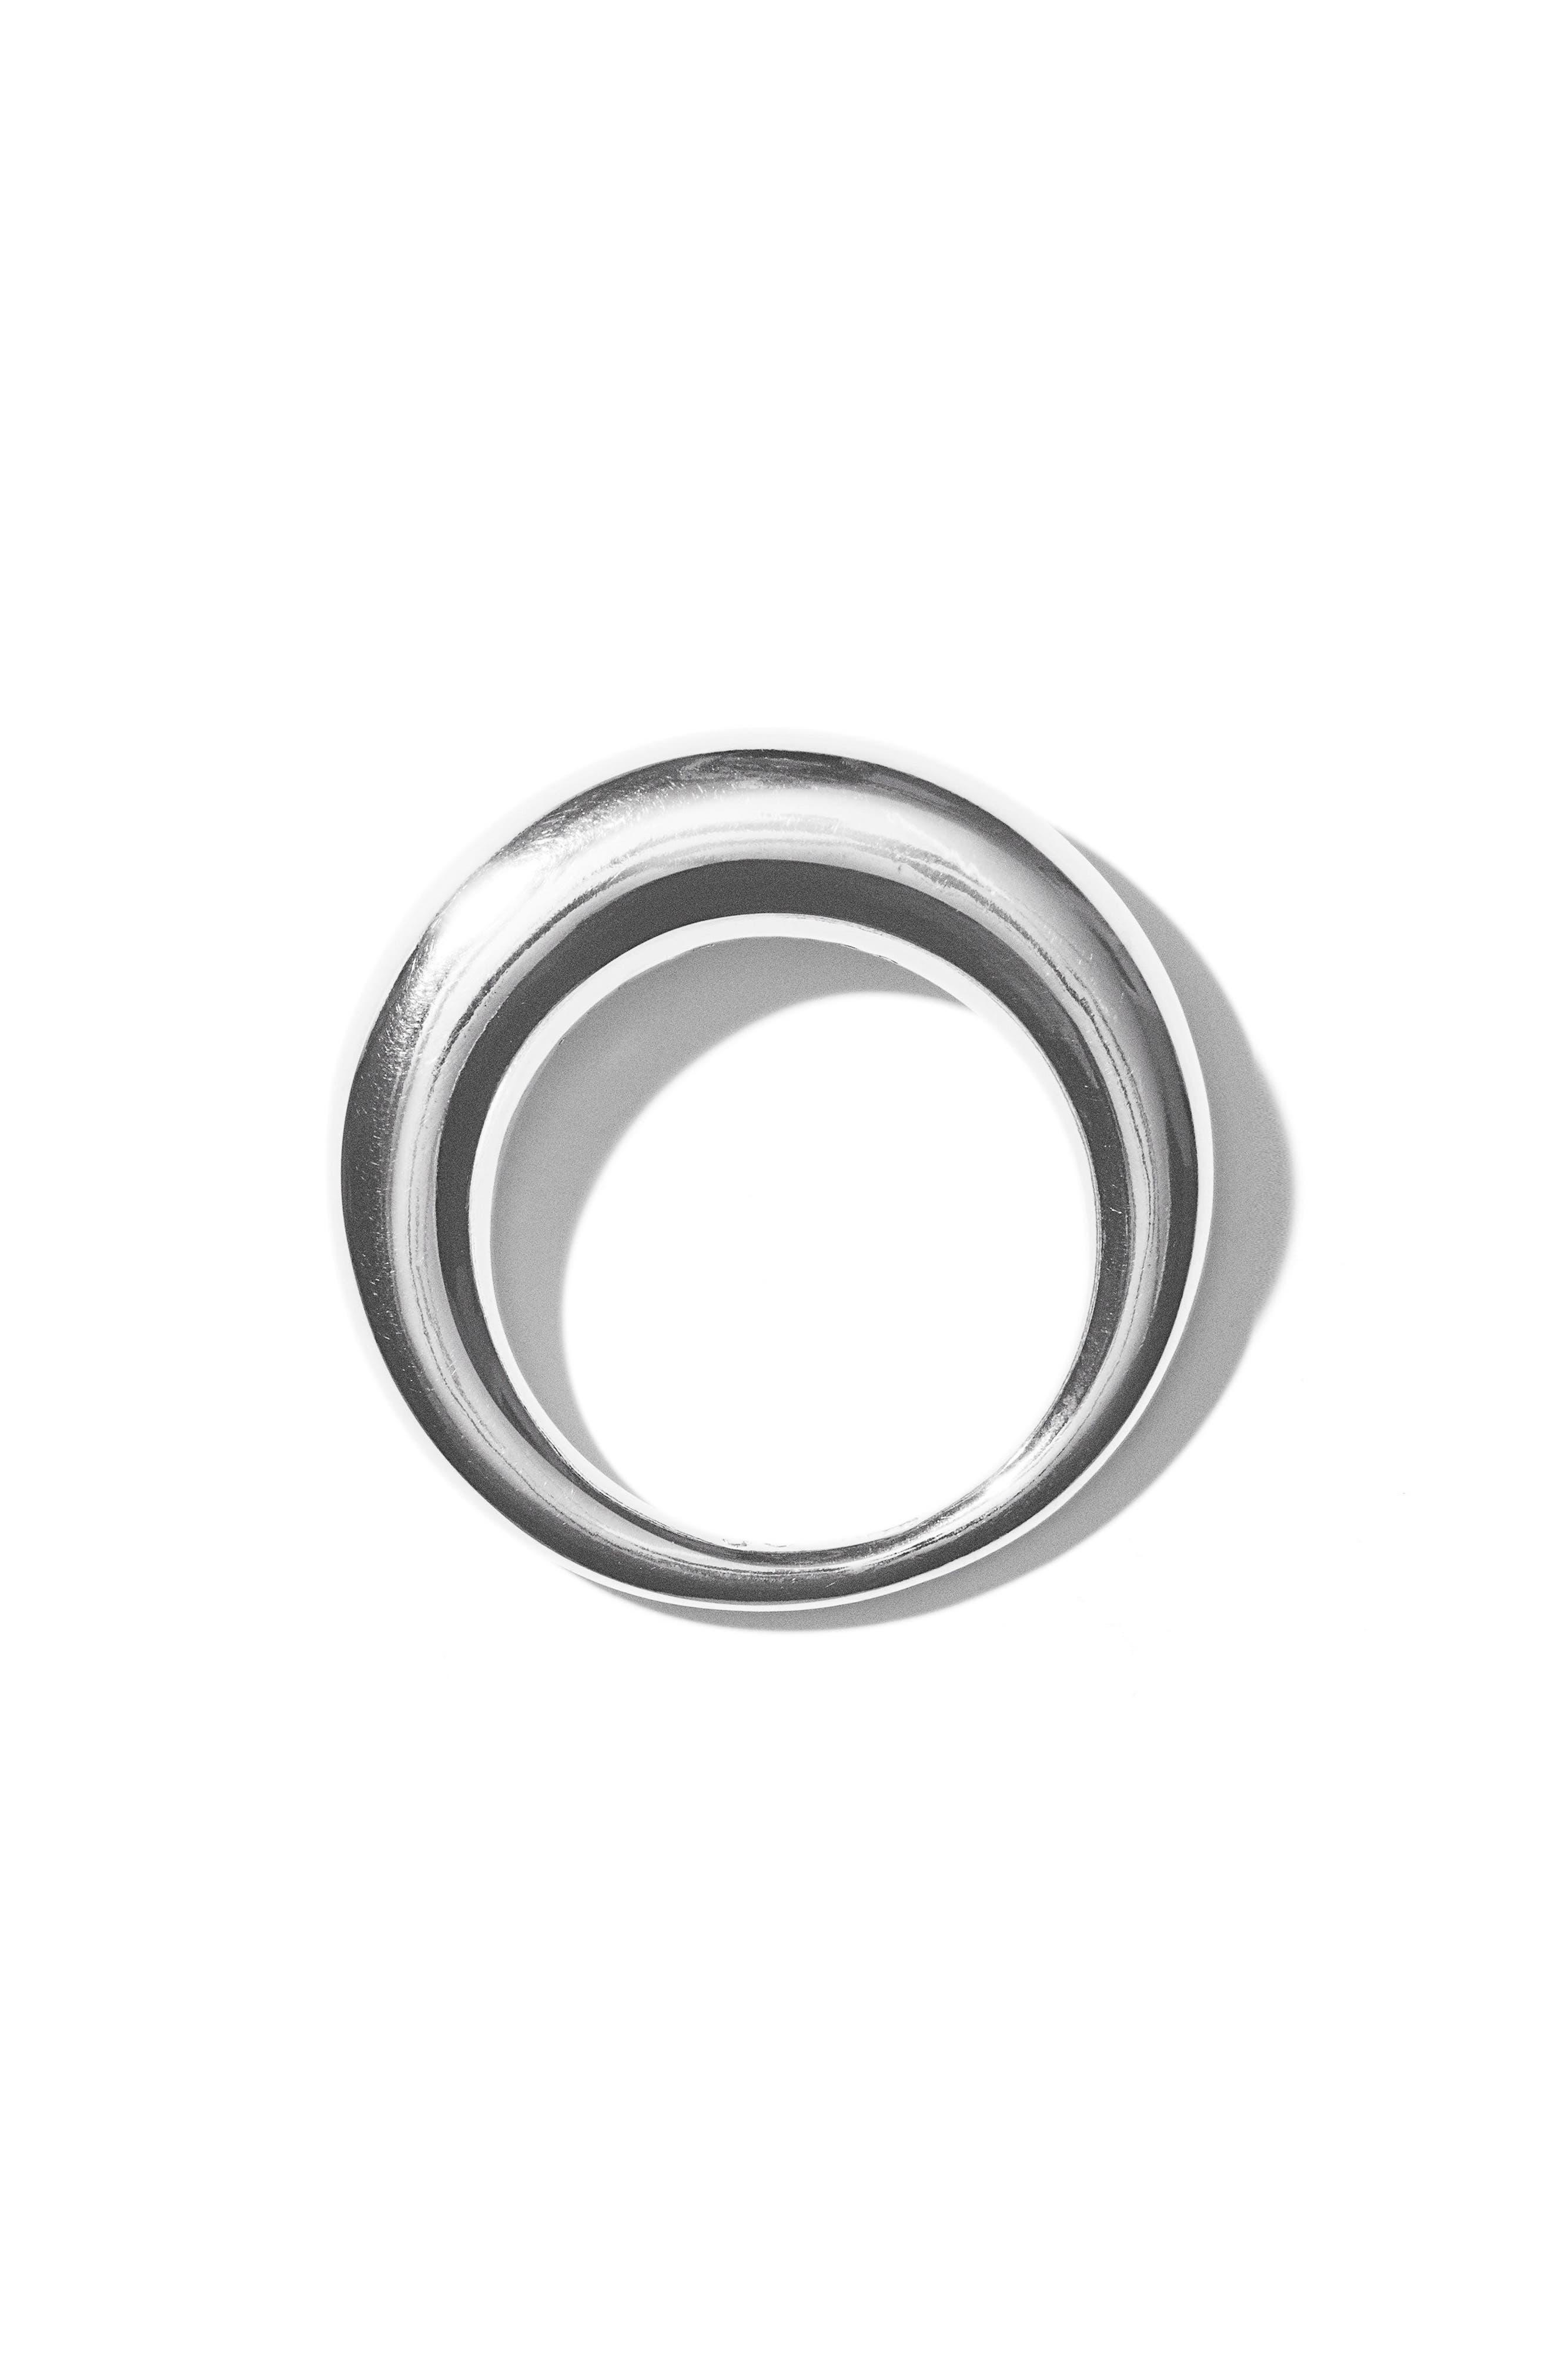 Large Snake Polished Silver Ring,                             Alternate thumbnail 2, color,                             POLISHED SILVER